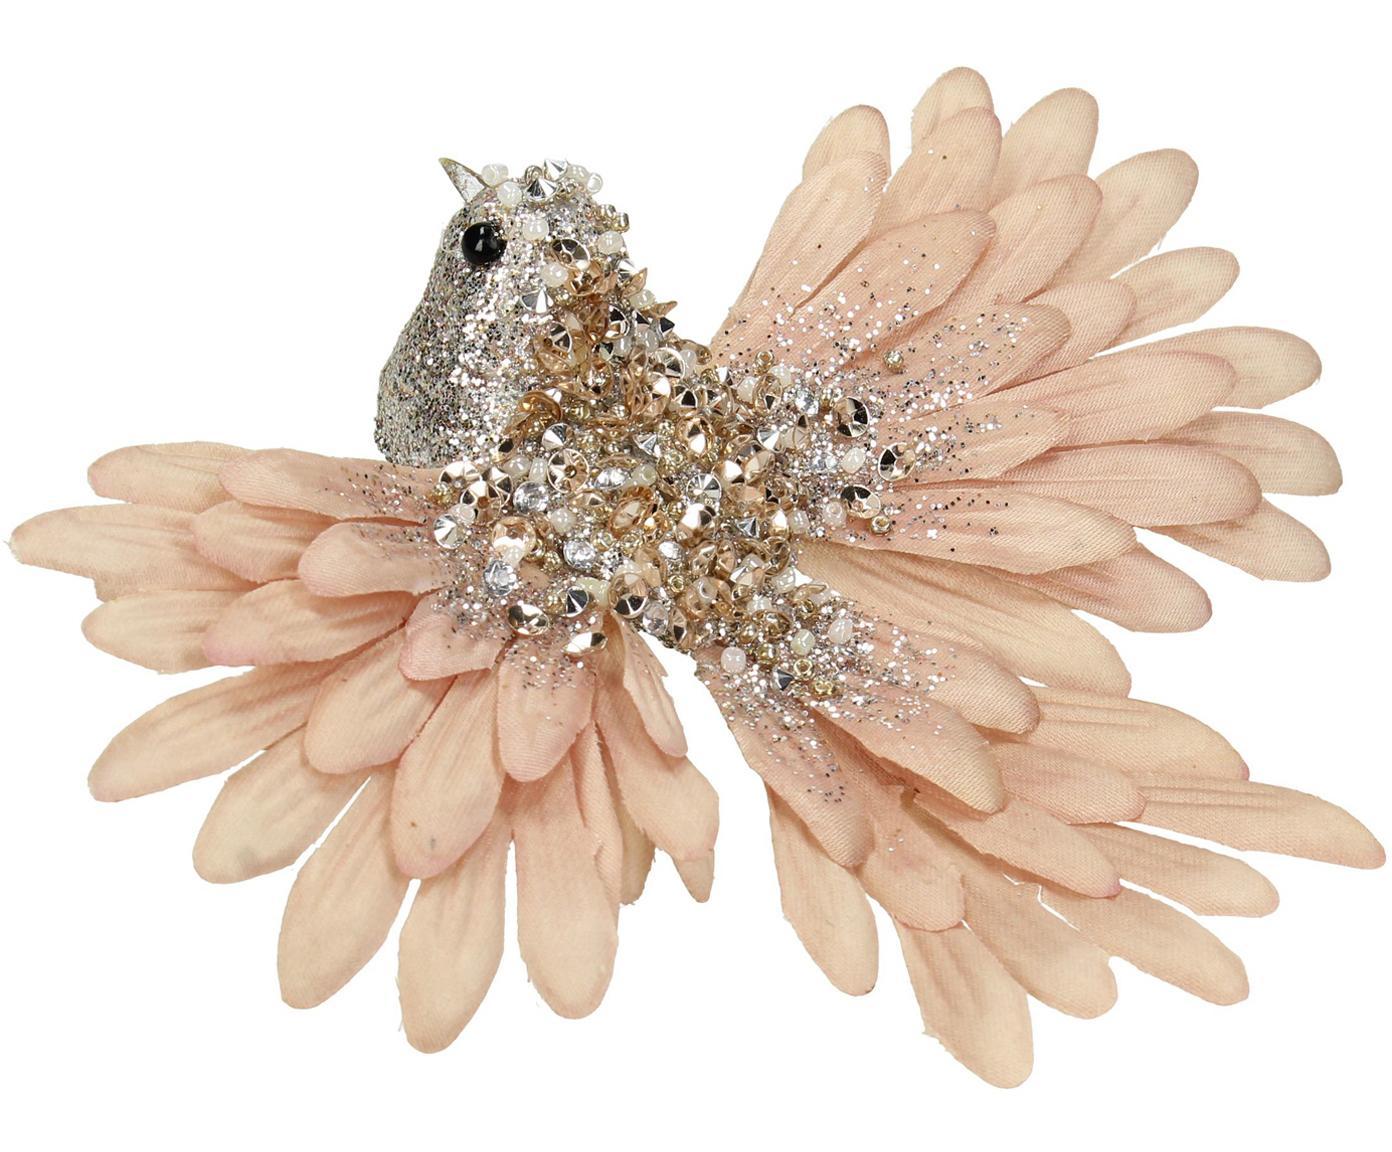 Baumanhänger Bird, Polyester, Kunststoff, Champagnerfarben, Hellrosa, 15 x 5 cm